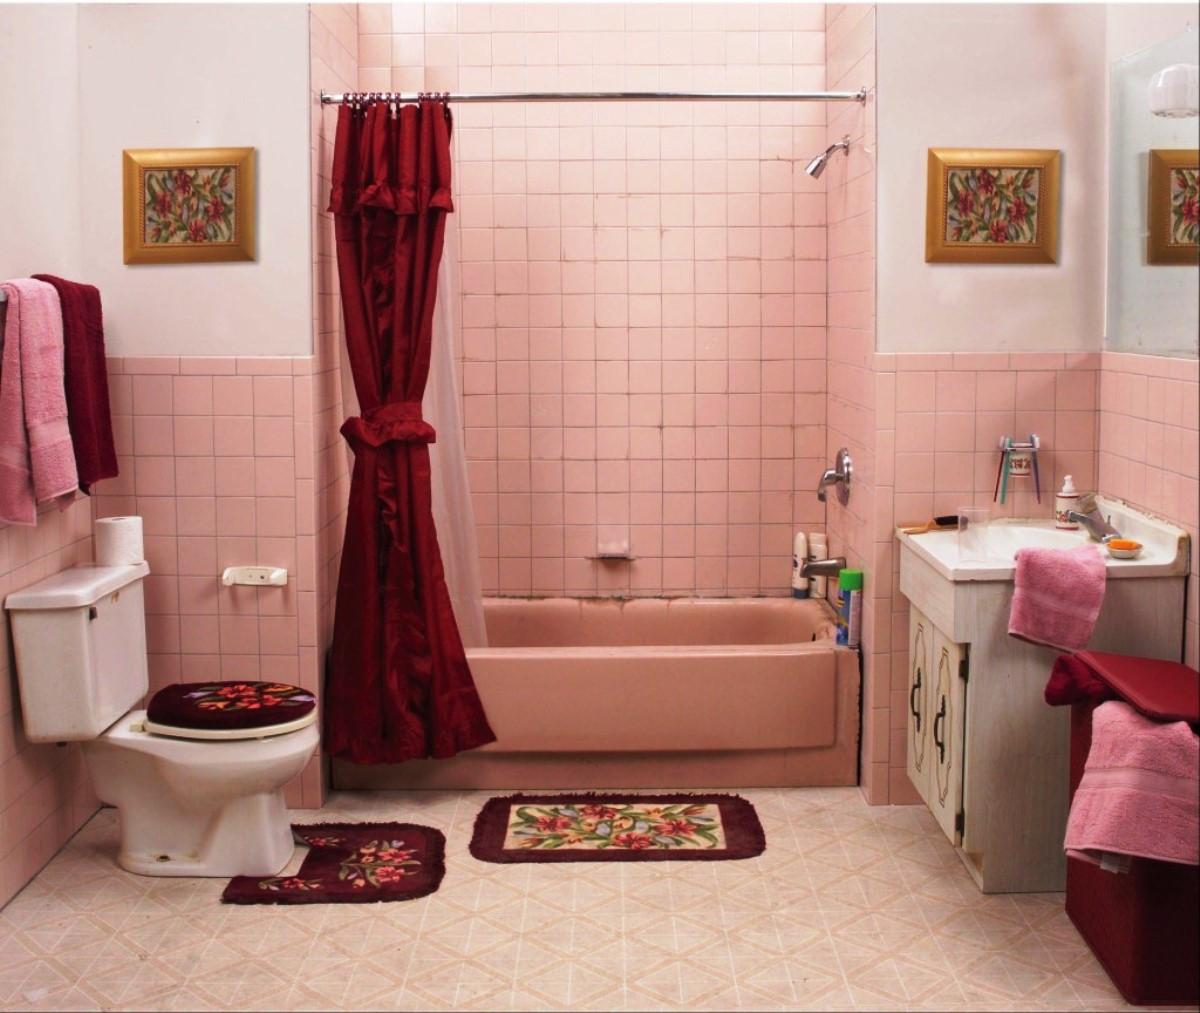 Cute bathroom in the dormitory